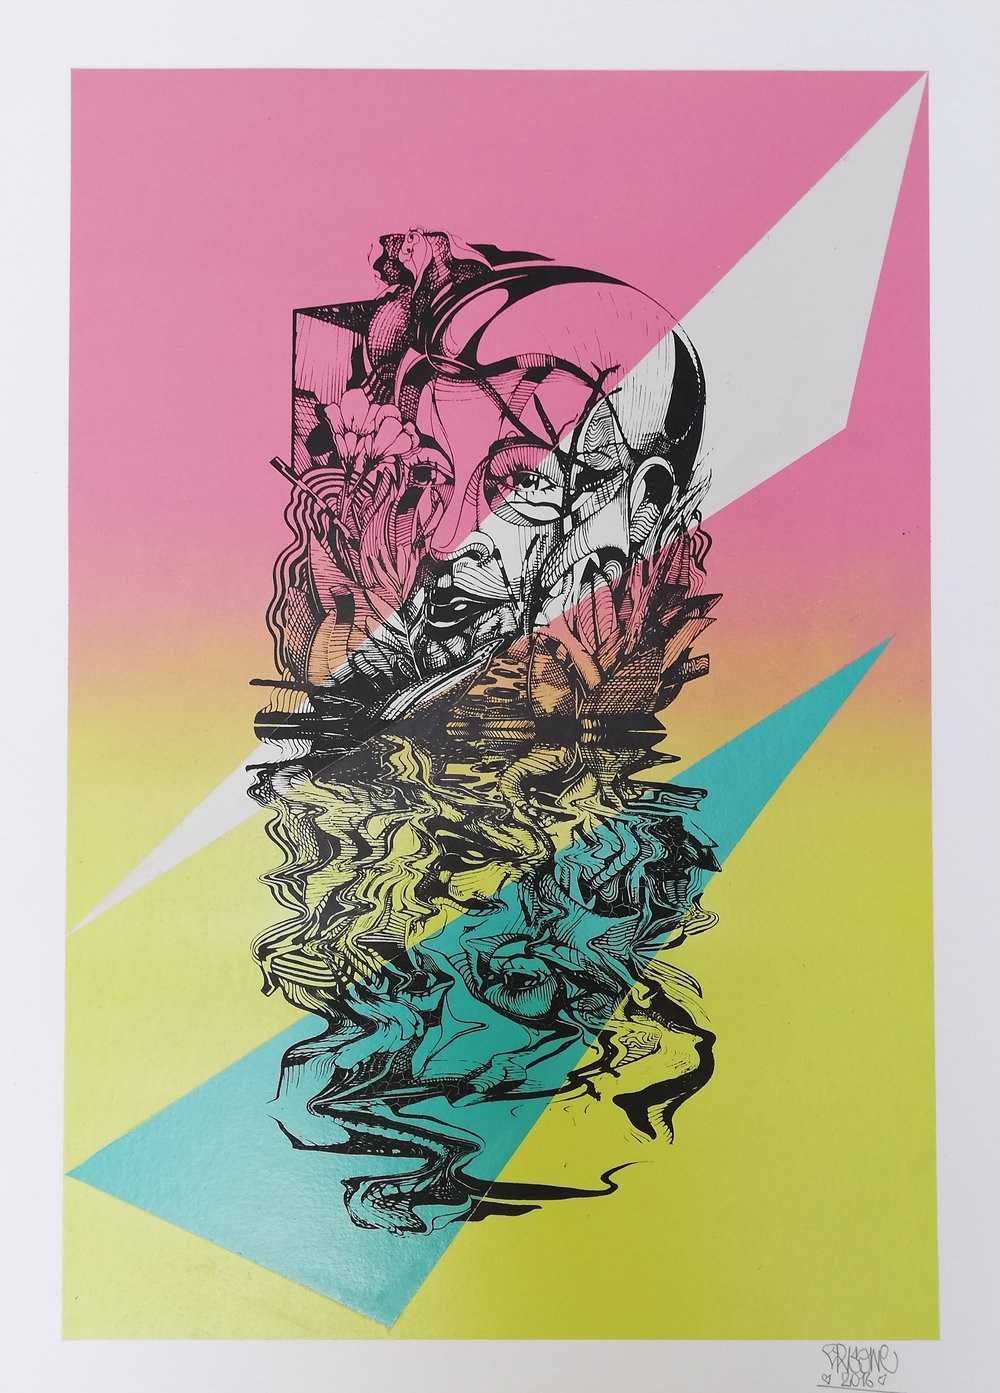 RF LKT #2 (2018) - 75 x 54 cm - Serigrafía intervenida con aerosol Prueba de artista